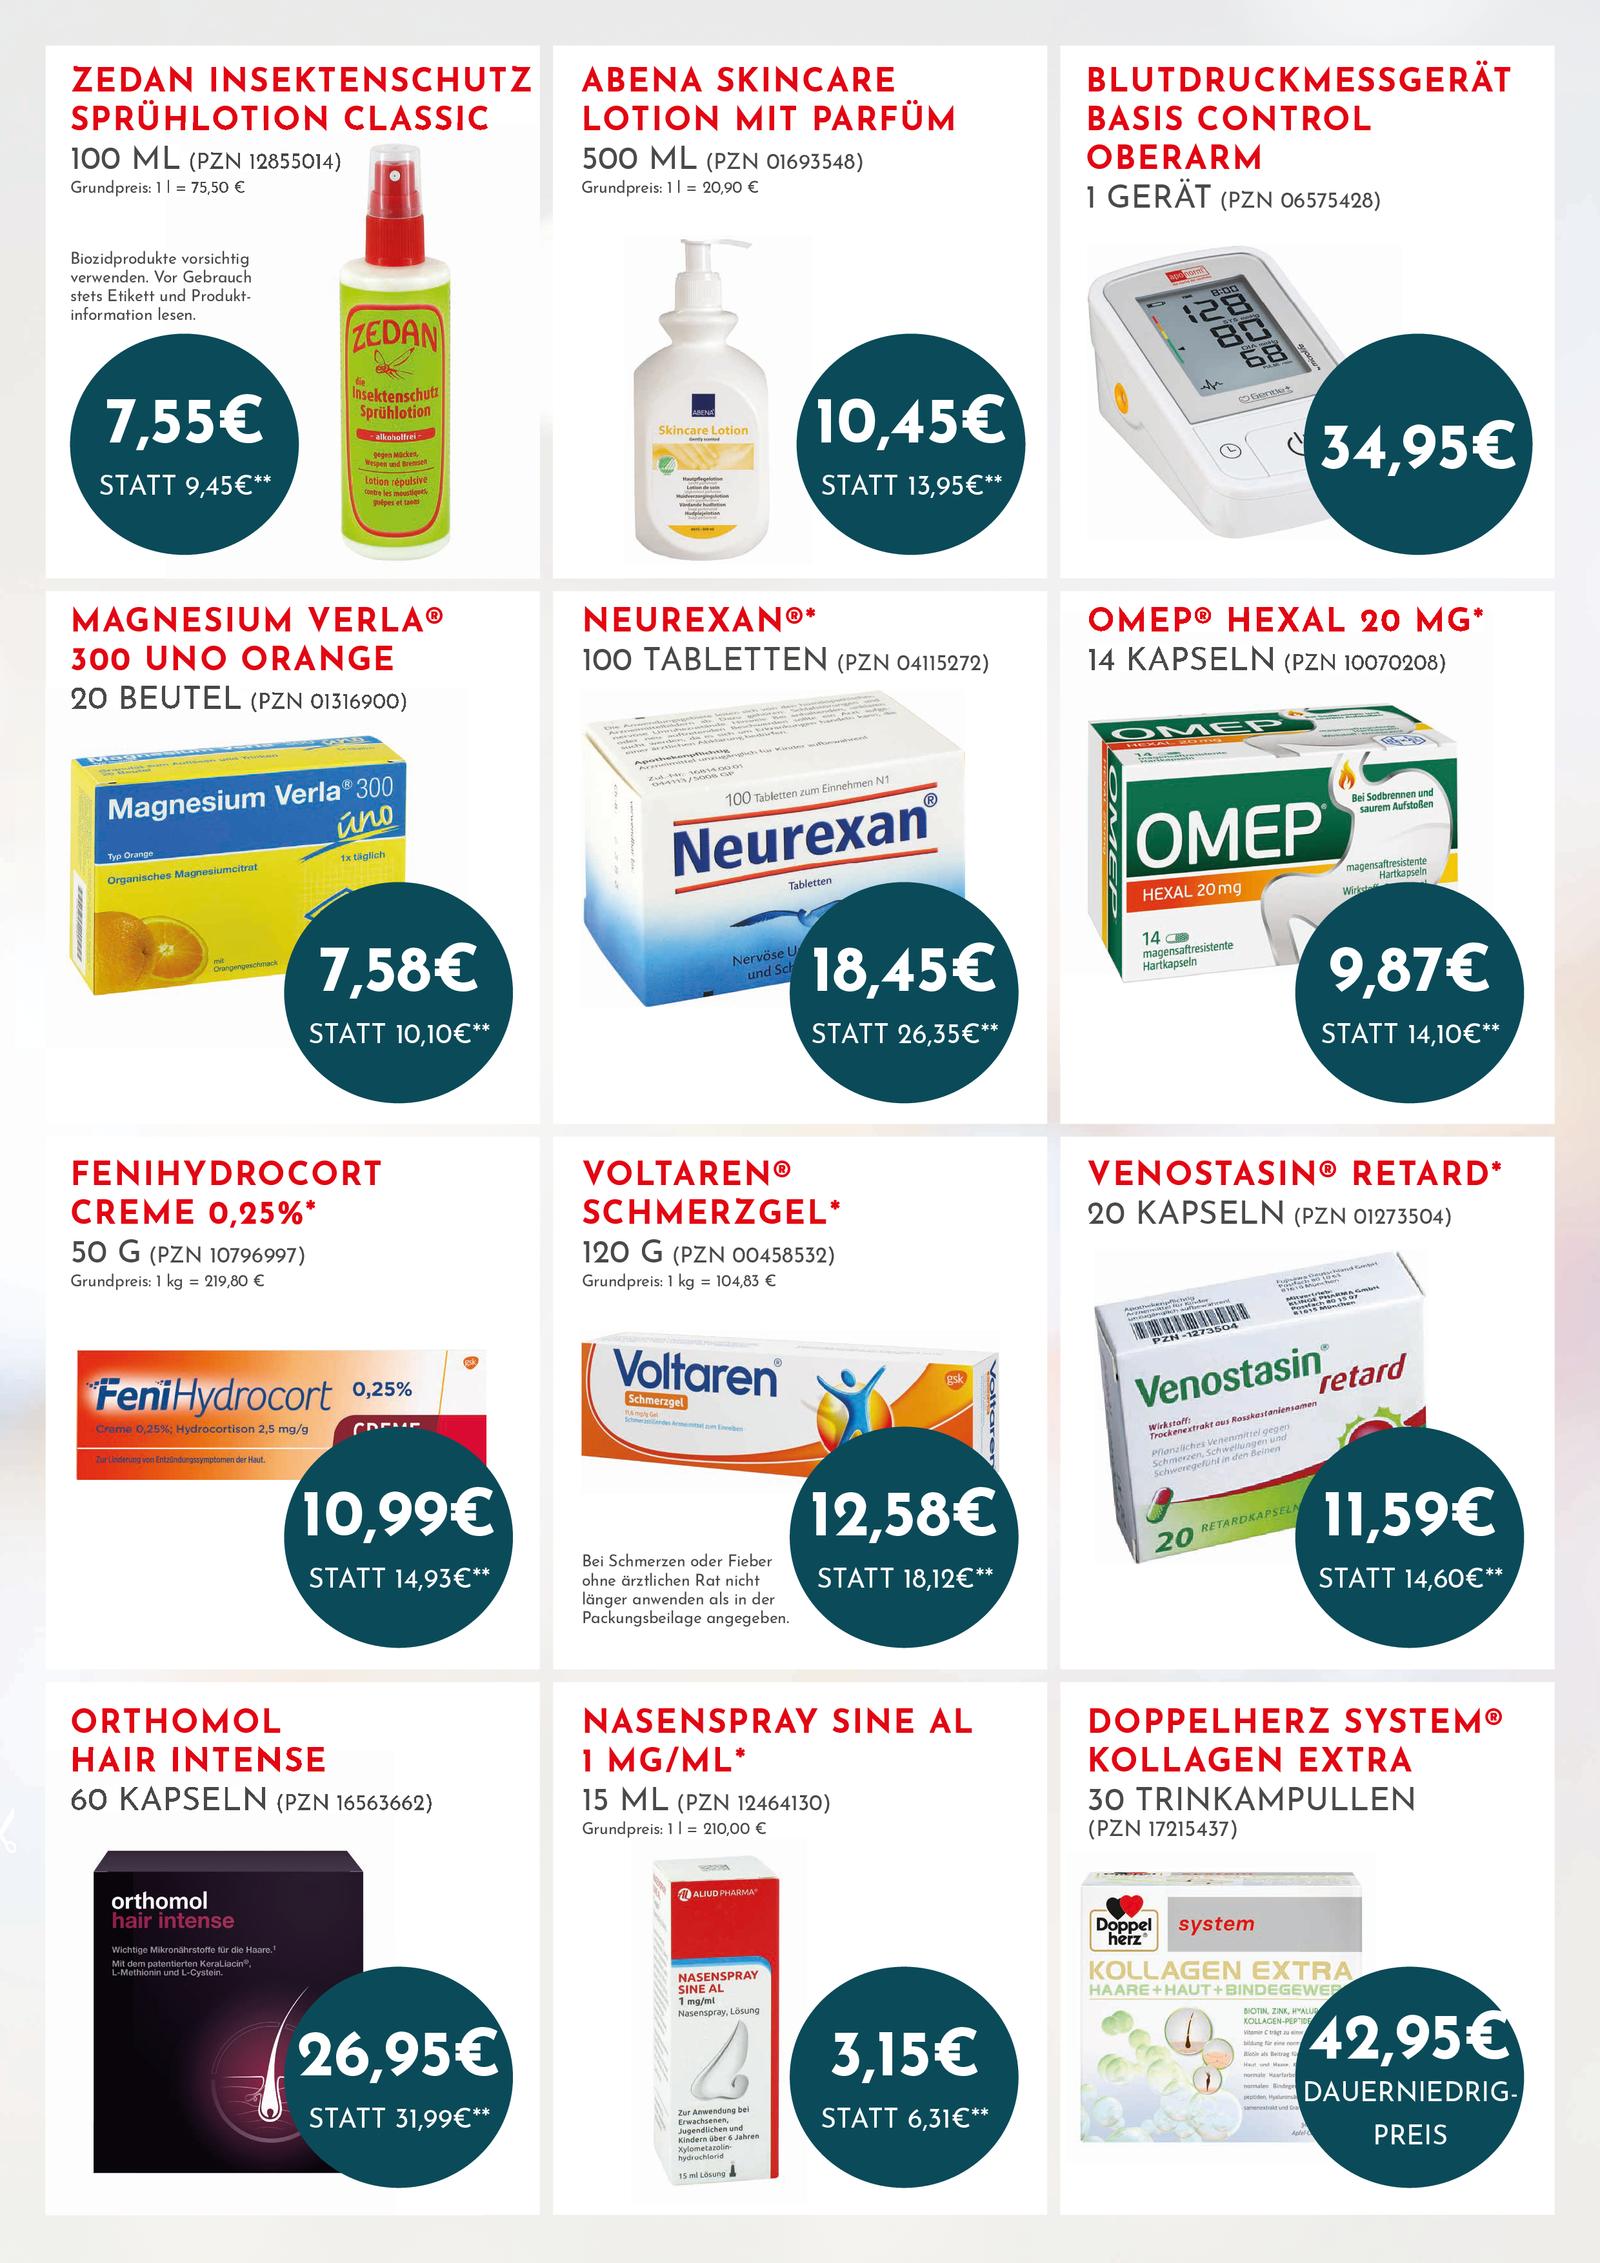 https://mein-uploads.apocdn.net/13945/leaflets/13945_flyer-Seite4.png